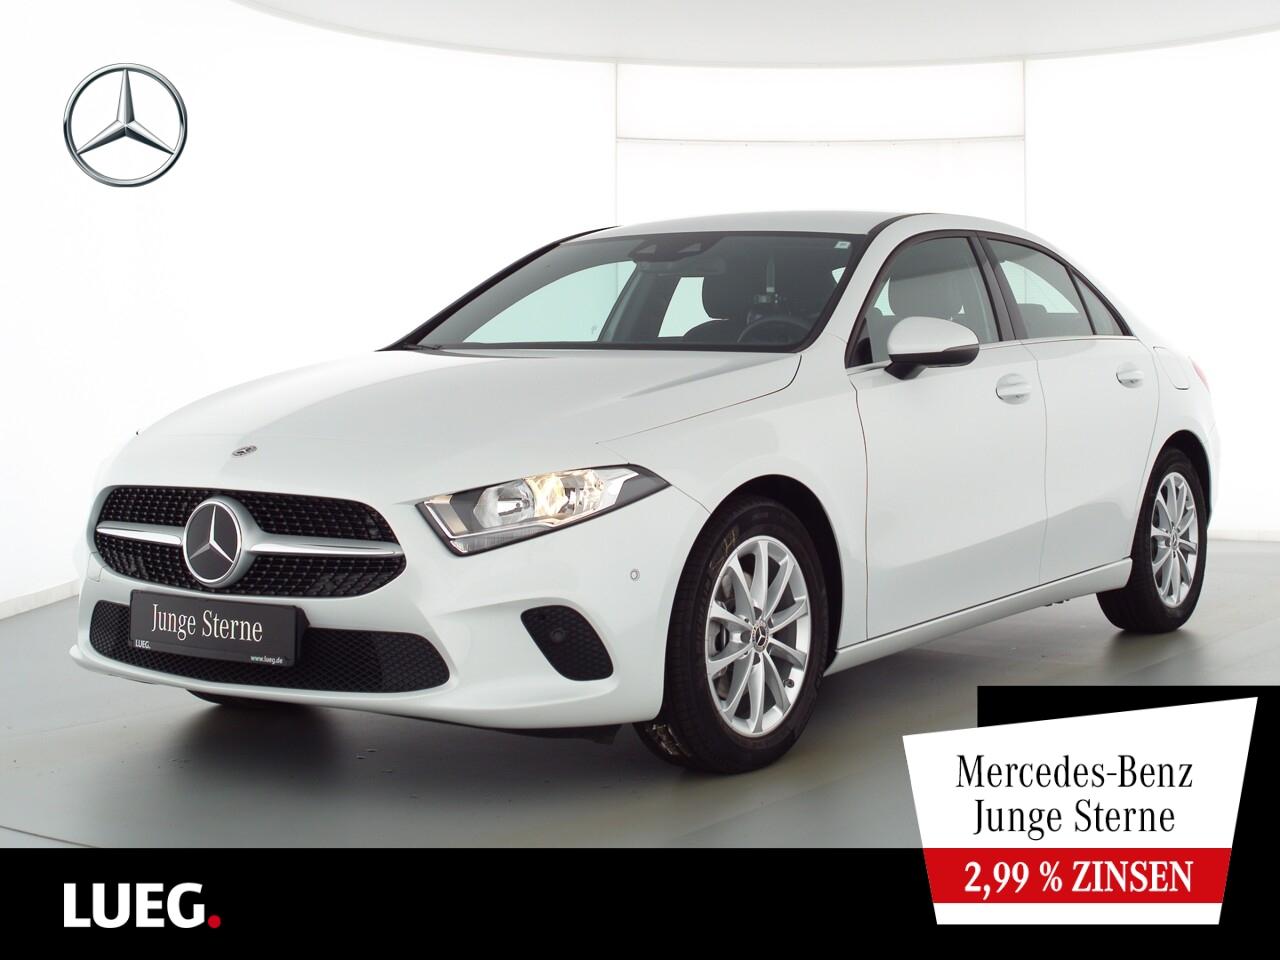 Mercedes-Benz A 200 MBUX+Navi+FahrassistenzP+ParkAssist+Kamera, Jahr 2020, Benzin